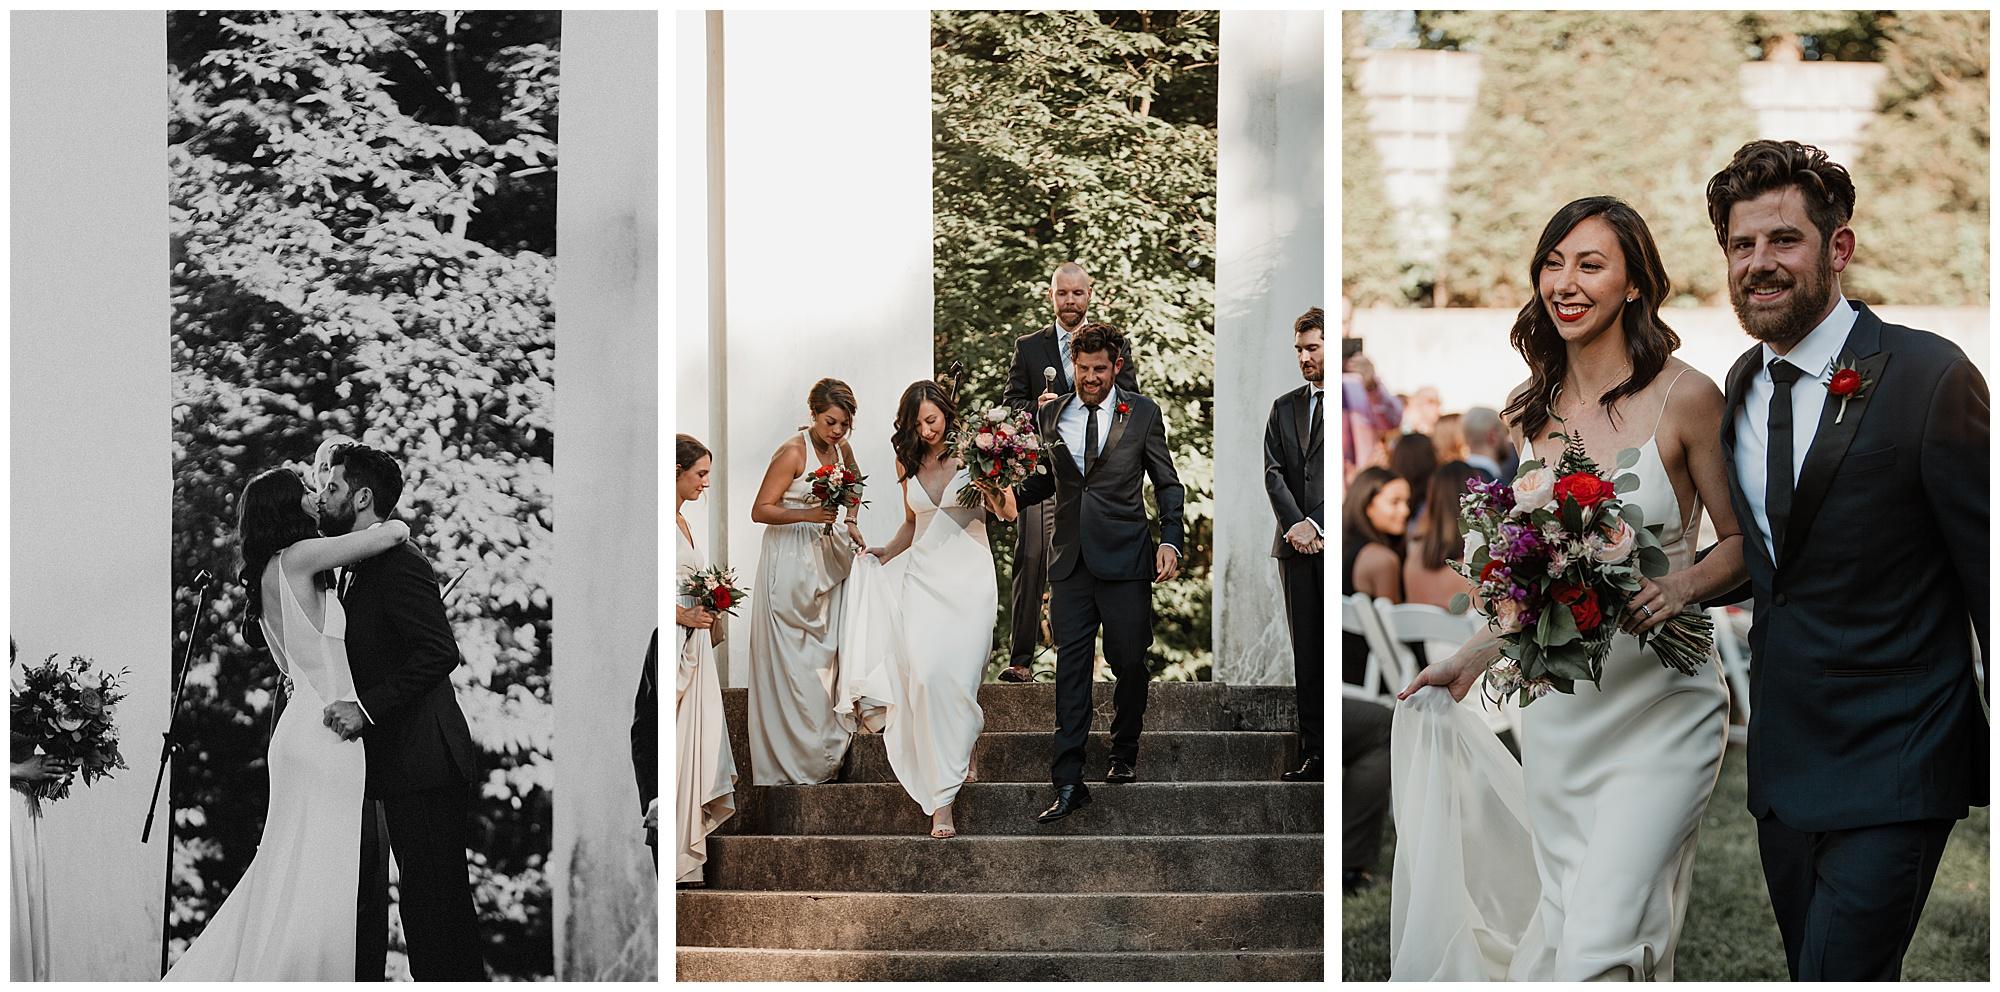 allerton_park_wedding_champaign_il_chicago_wright_photographs_ne_0033.jpg